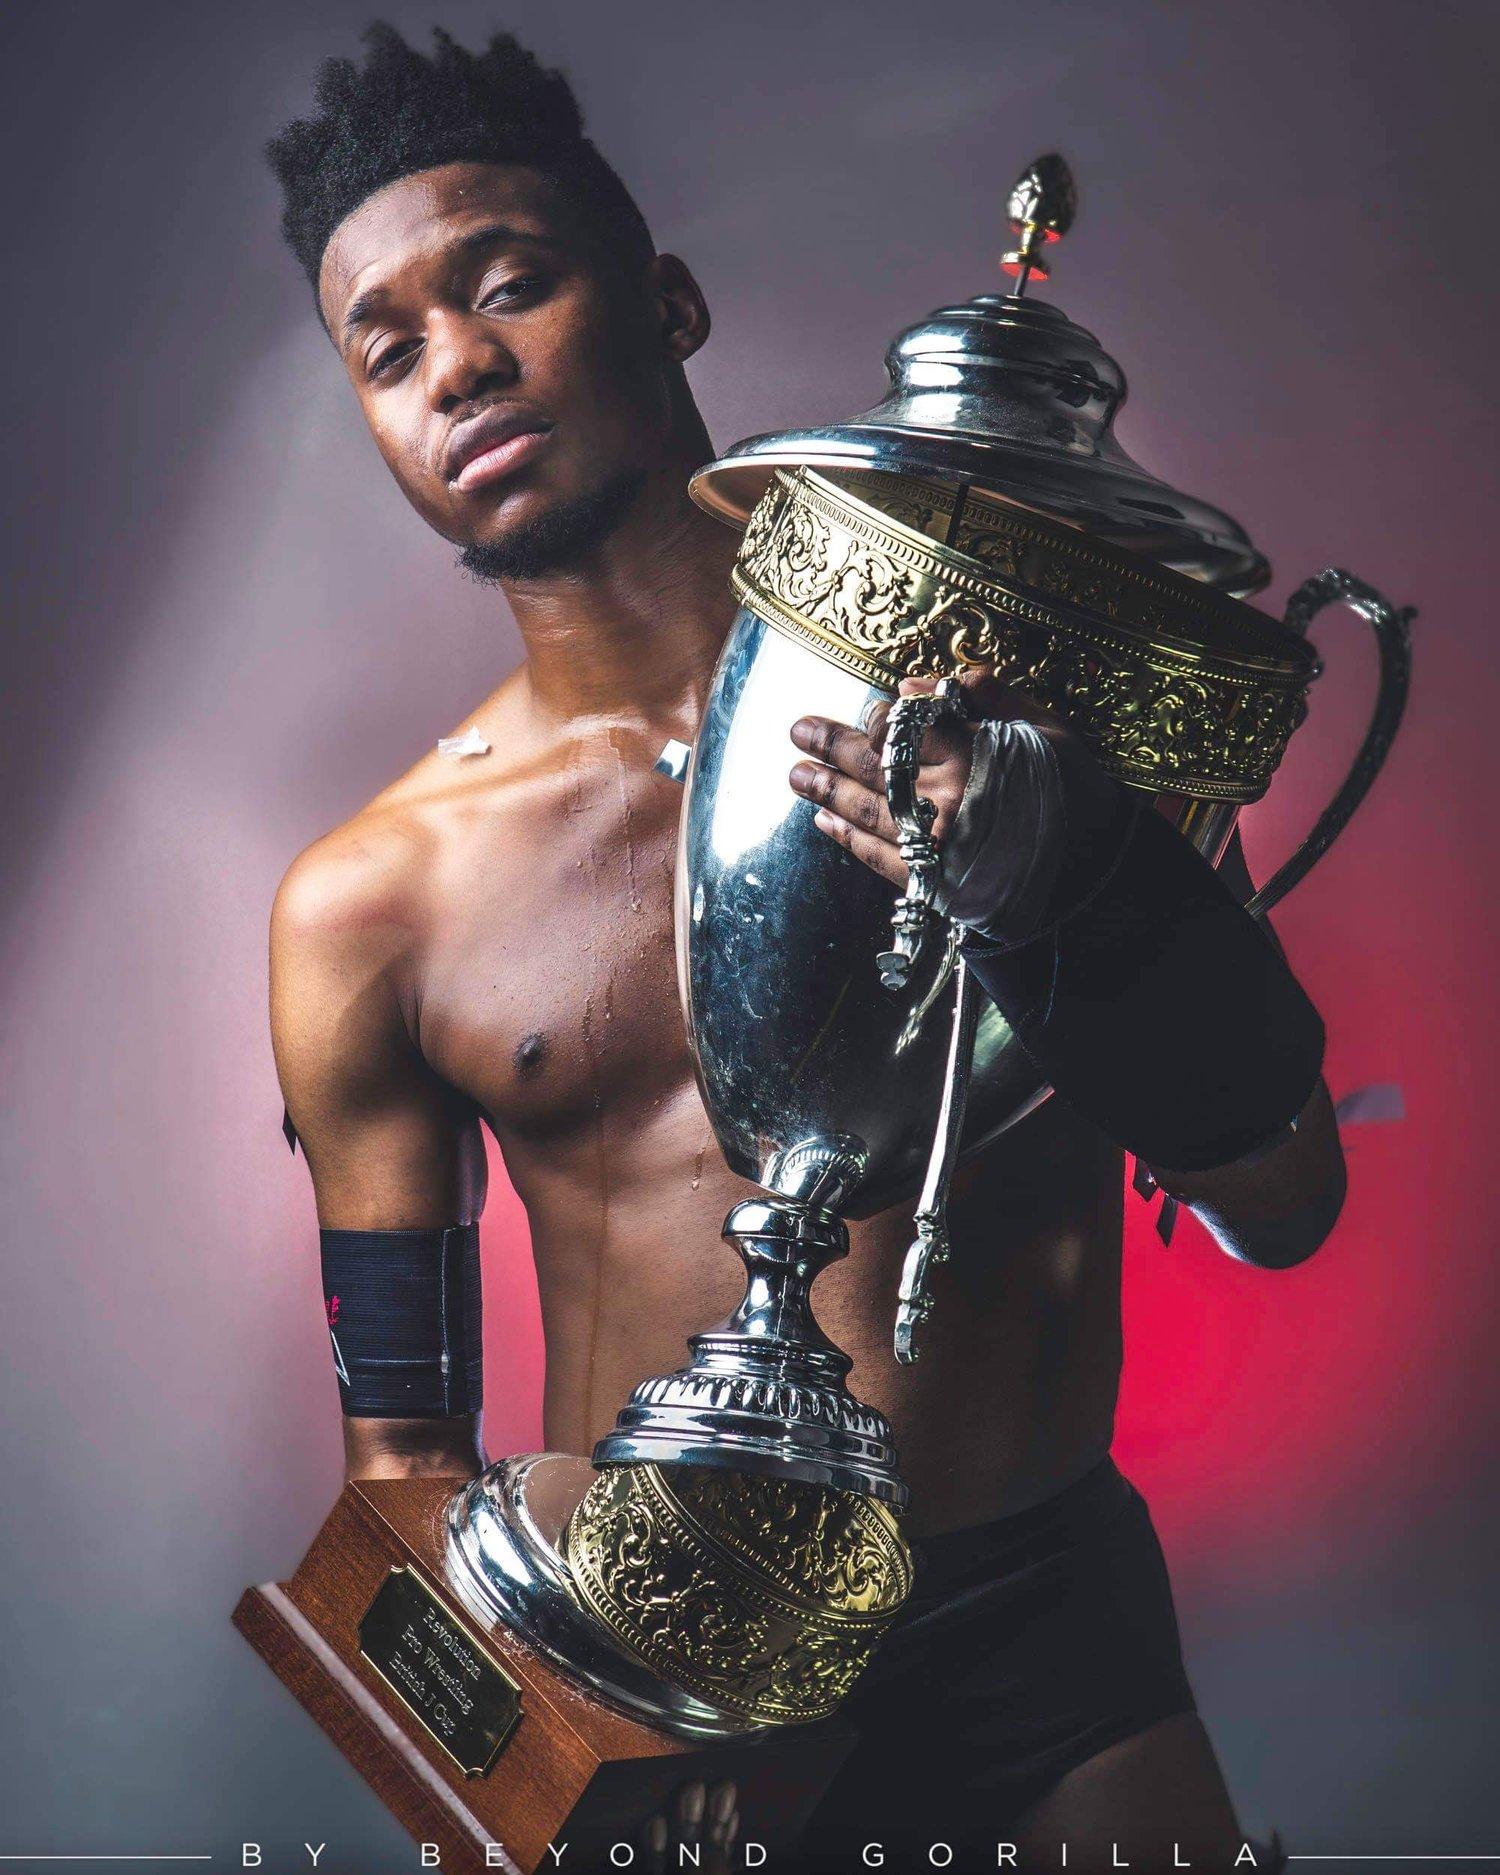 Image of 2019 British J Cup Winner